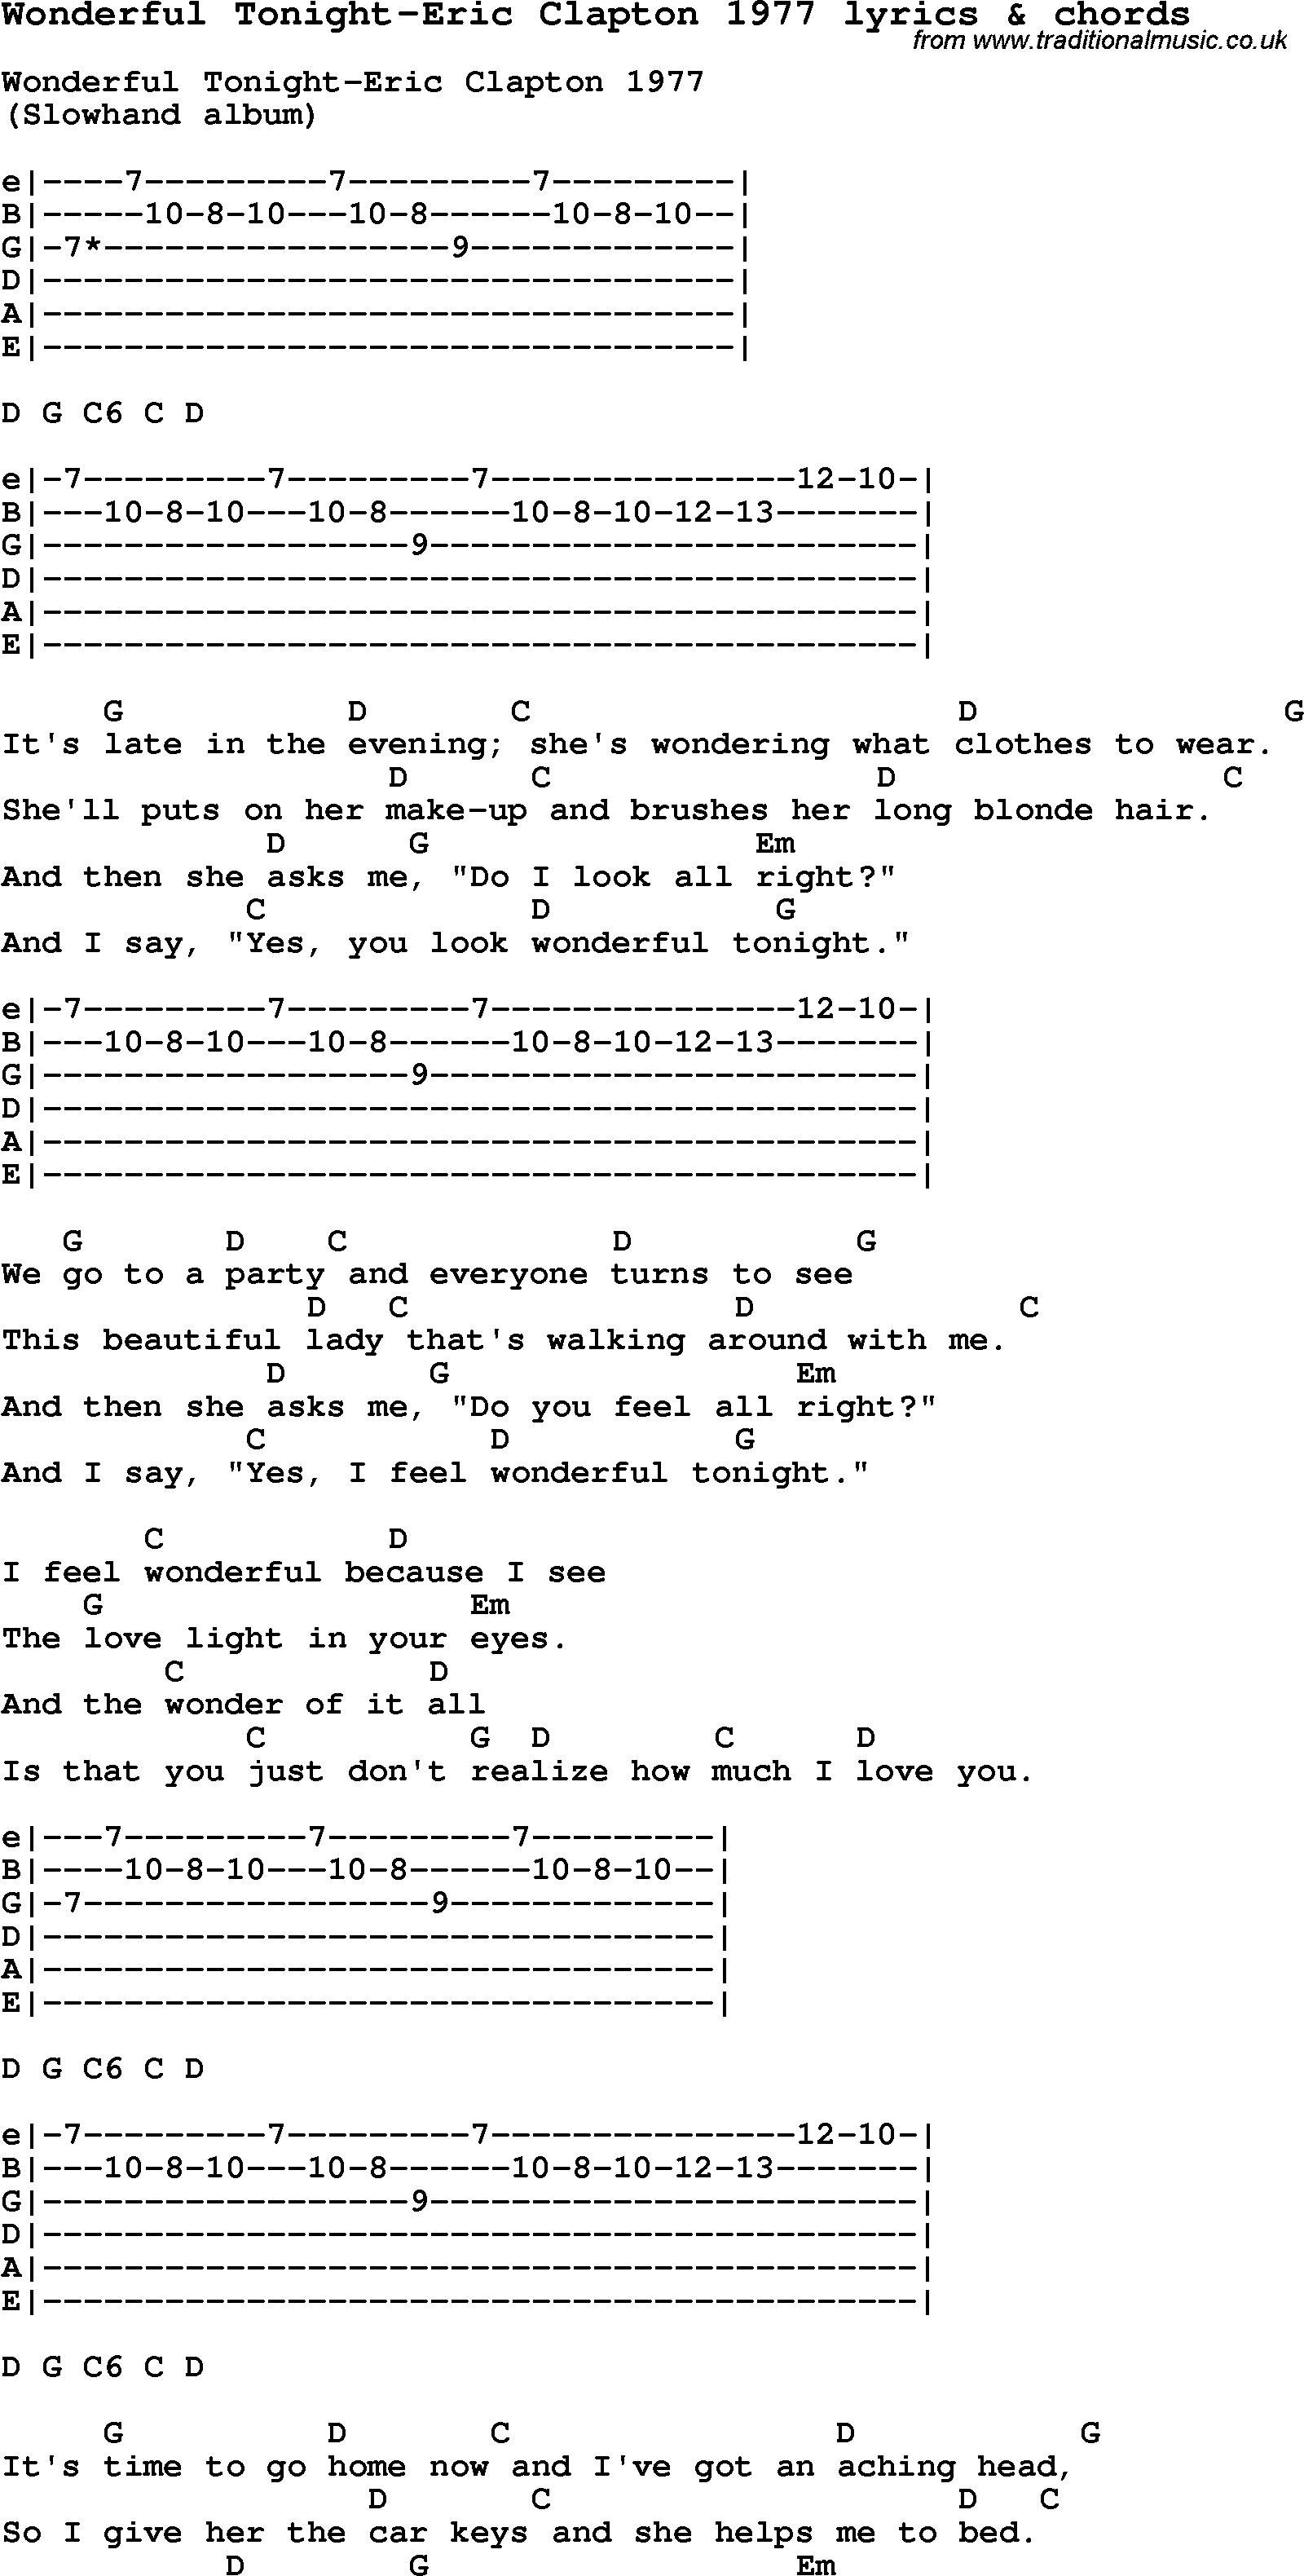 Love Song Lyrics for Wonderful Tonight Eric Clapton 15 with ...